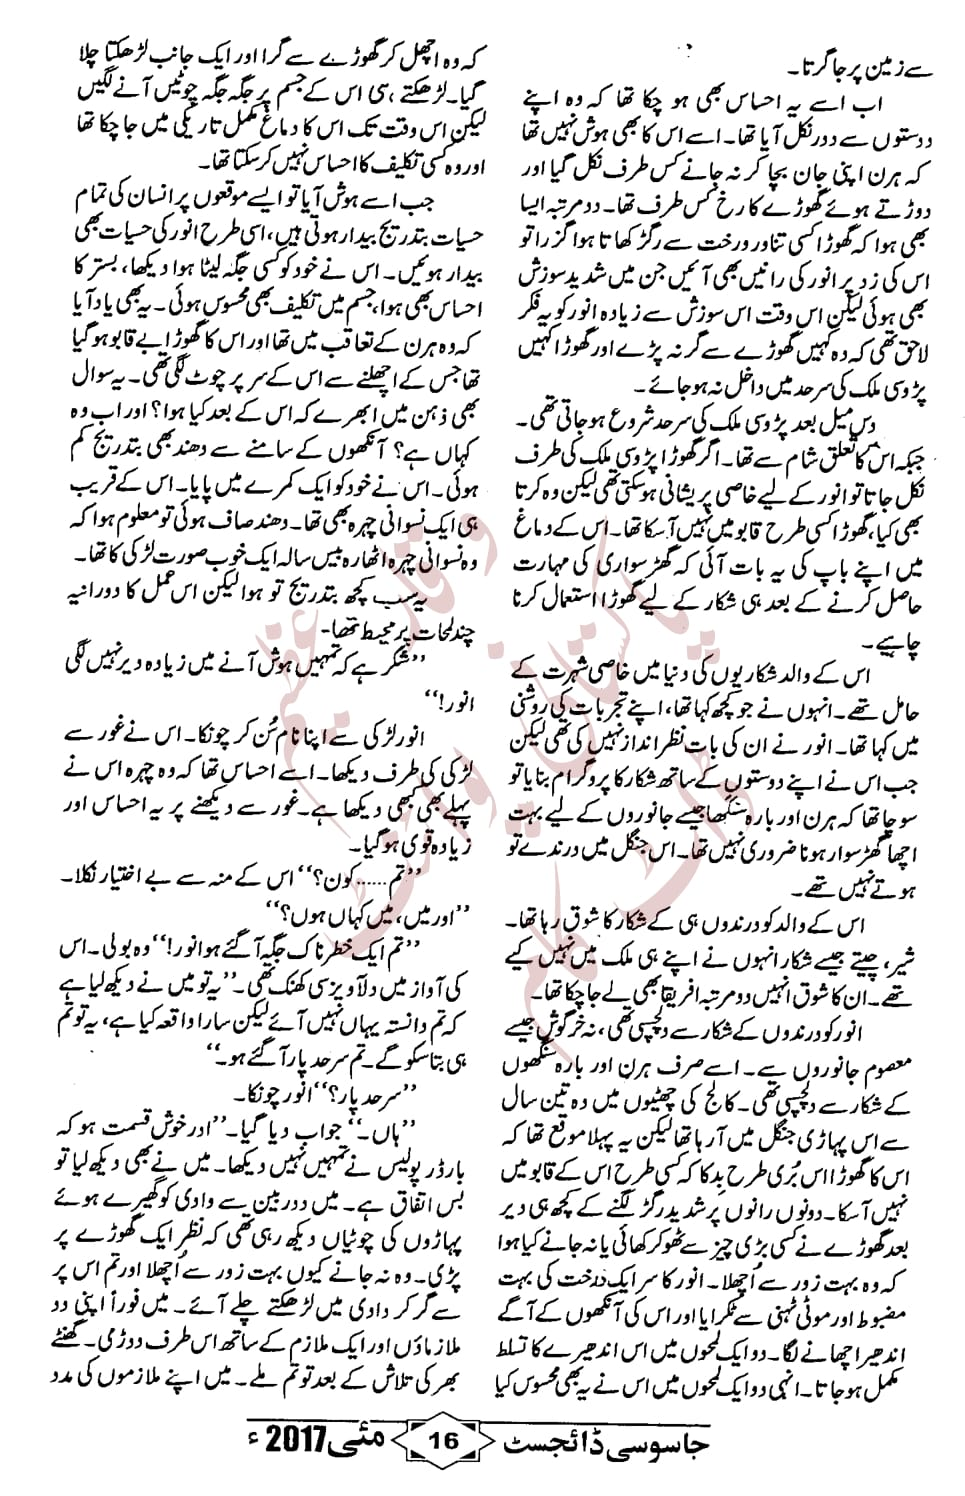 Free Urdu Digests: Jung e dilruba novel by H Iqbal online